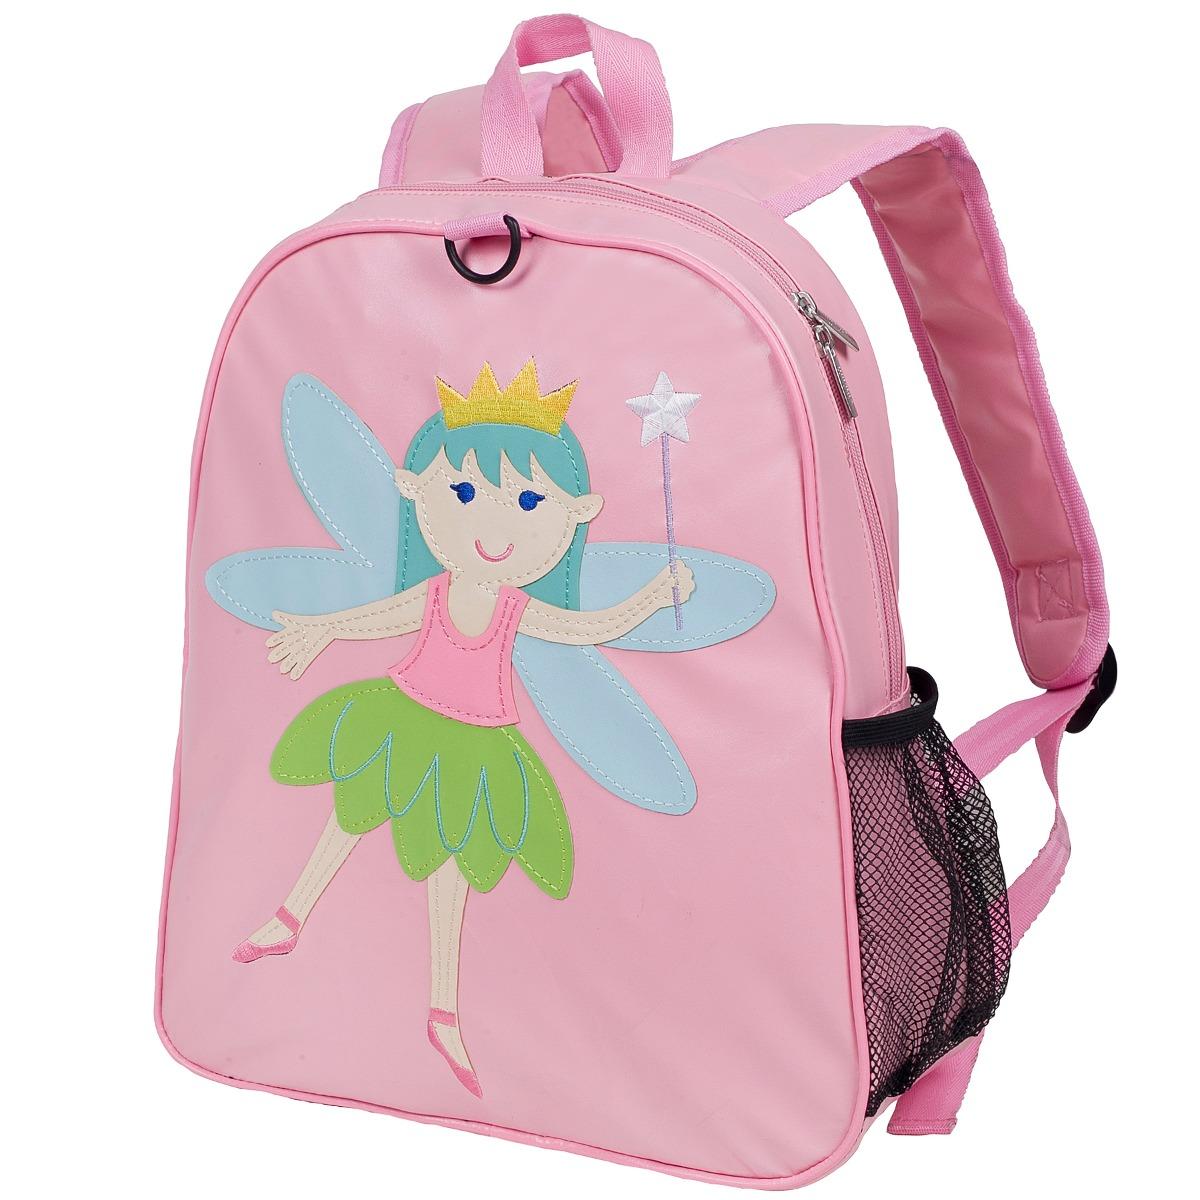 3f854d8c3 Maleta Bordada Con Hada Princesa Olive Kids 20417 - $ 128.550 en ...